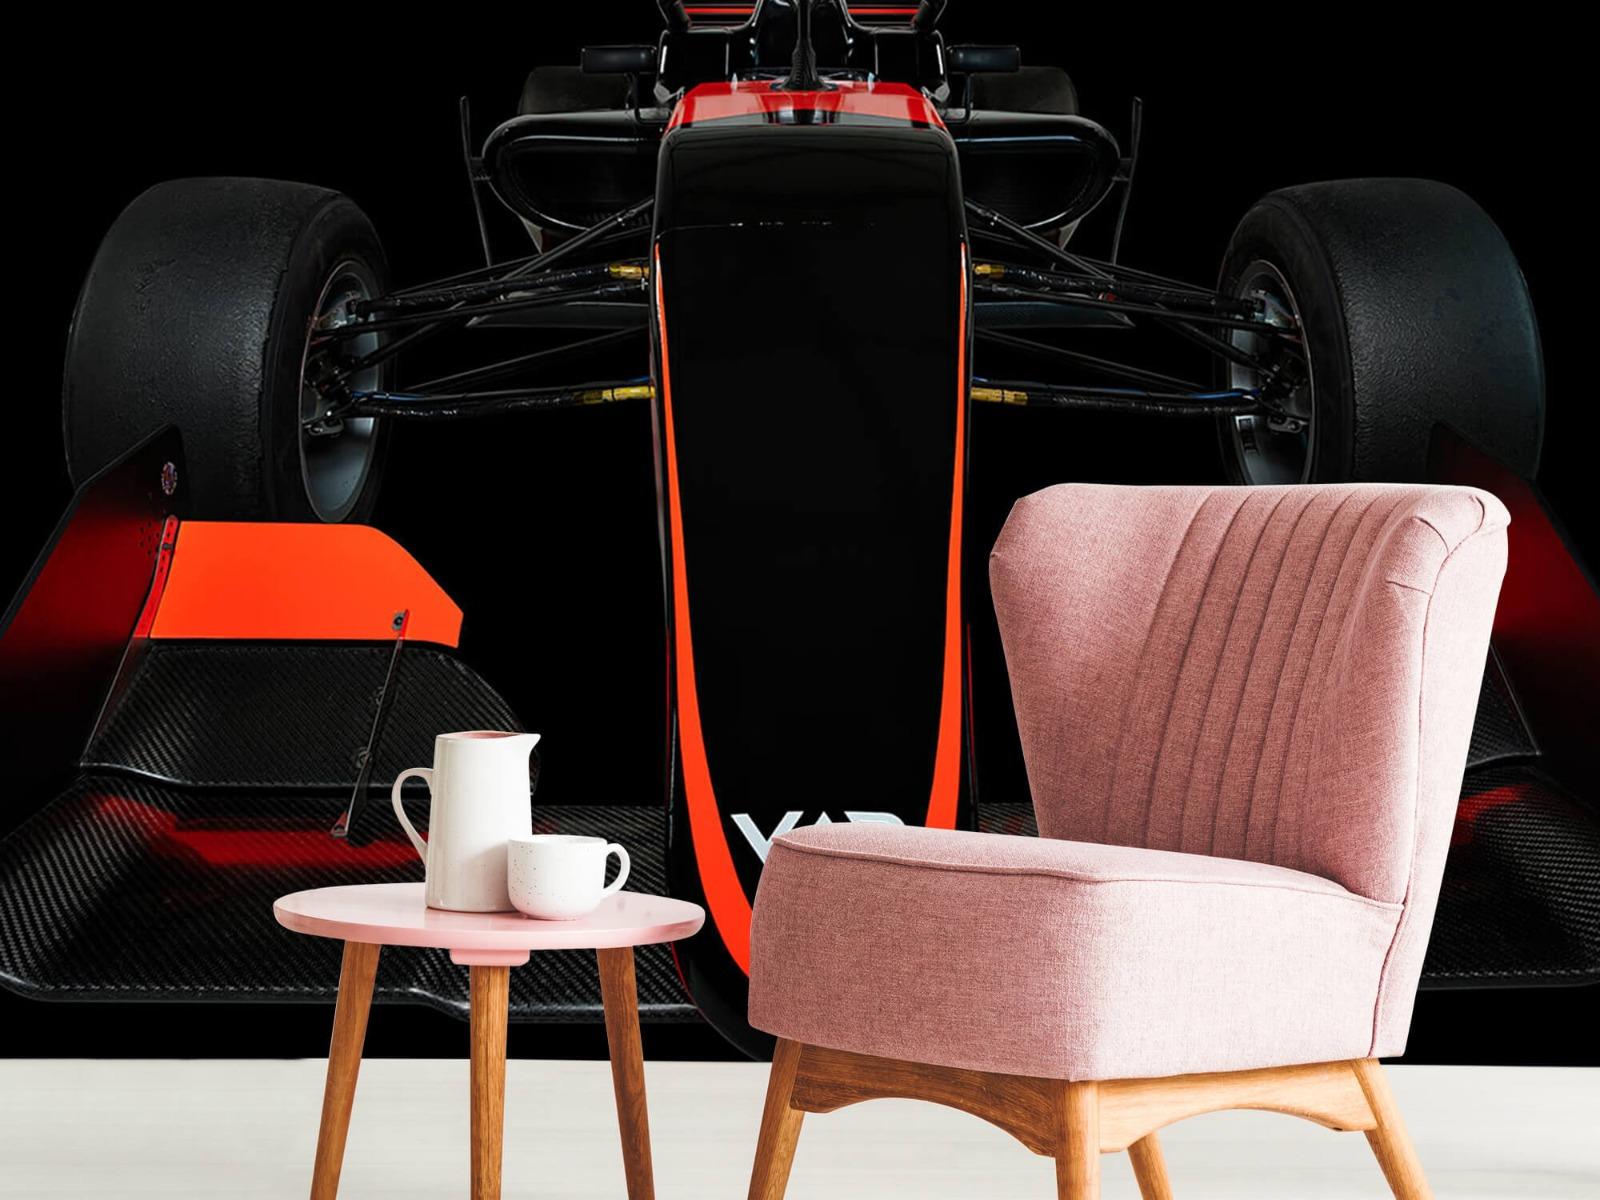 Sportauto's - Formule 3 - Lower front view - dark - Slaapkamer 9